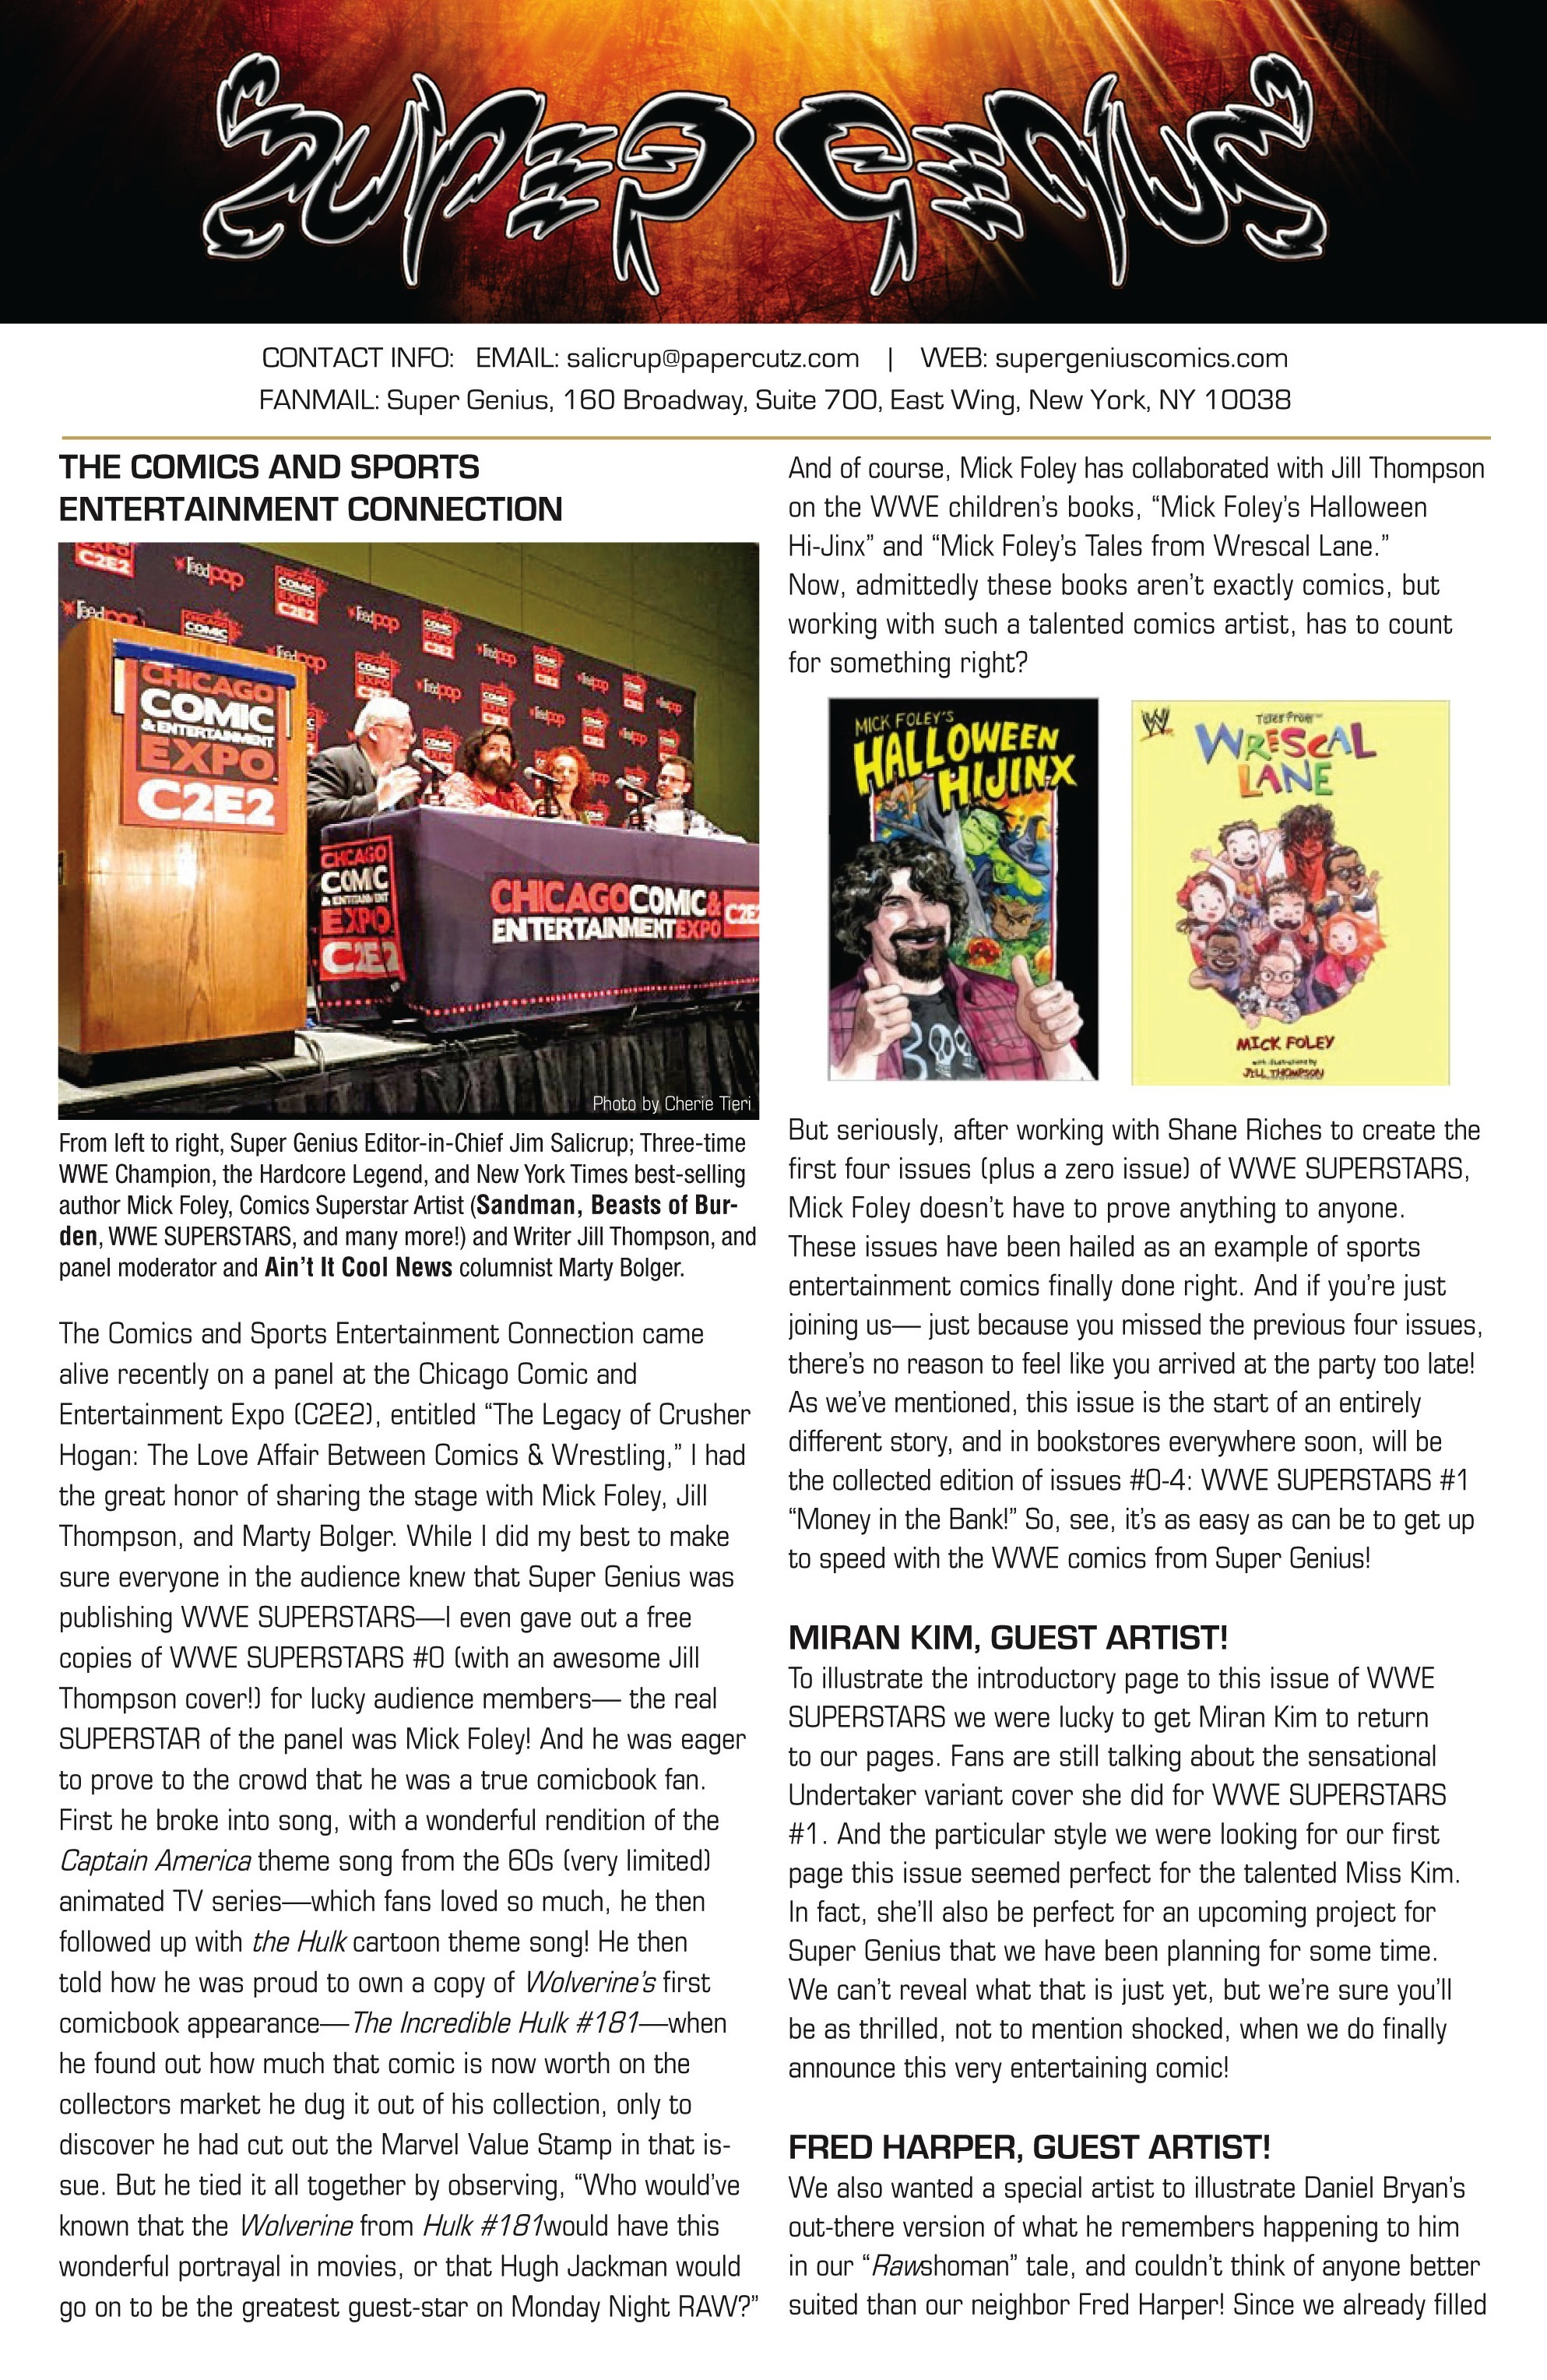 Read online WWE Superstars comic -  Issue #5 - 26